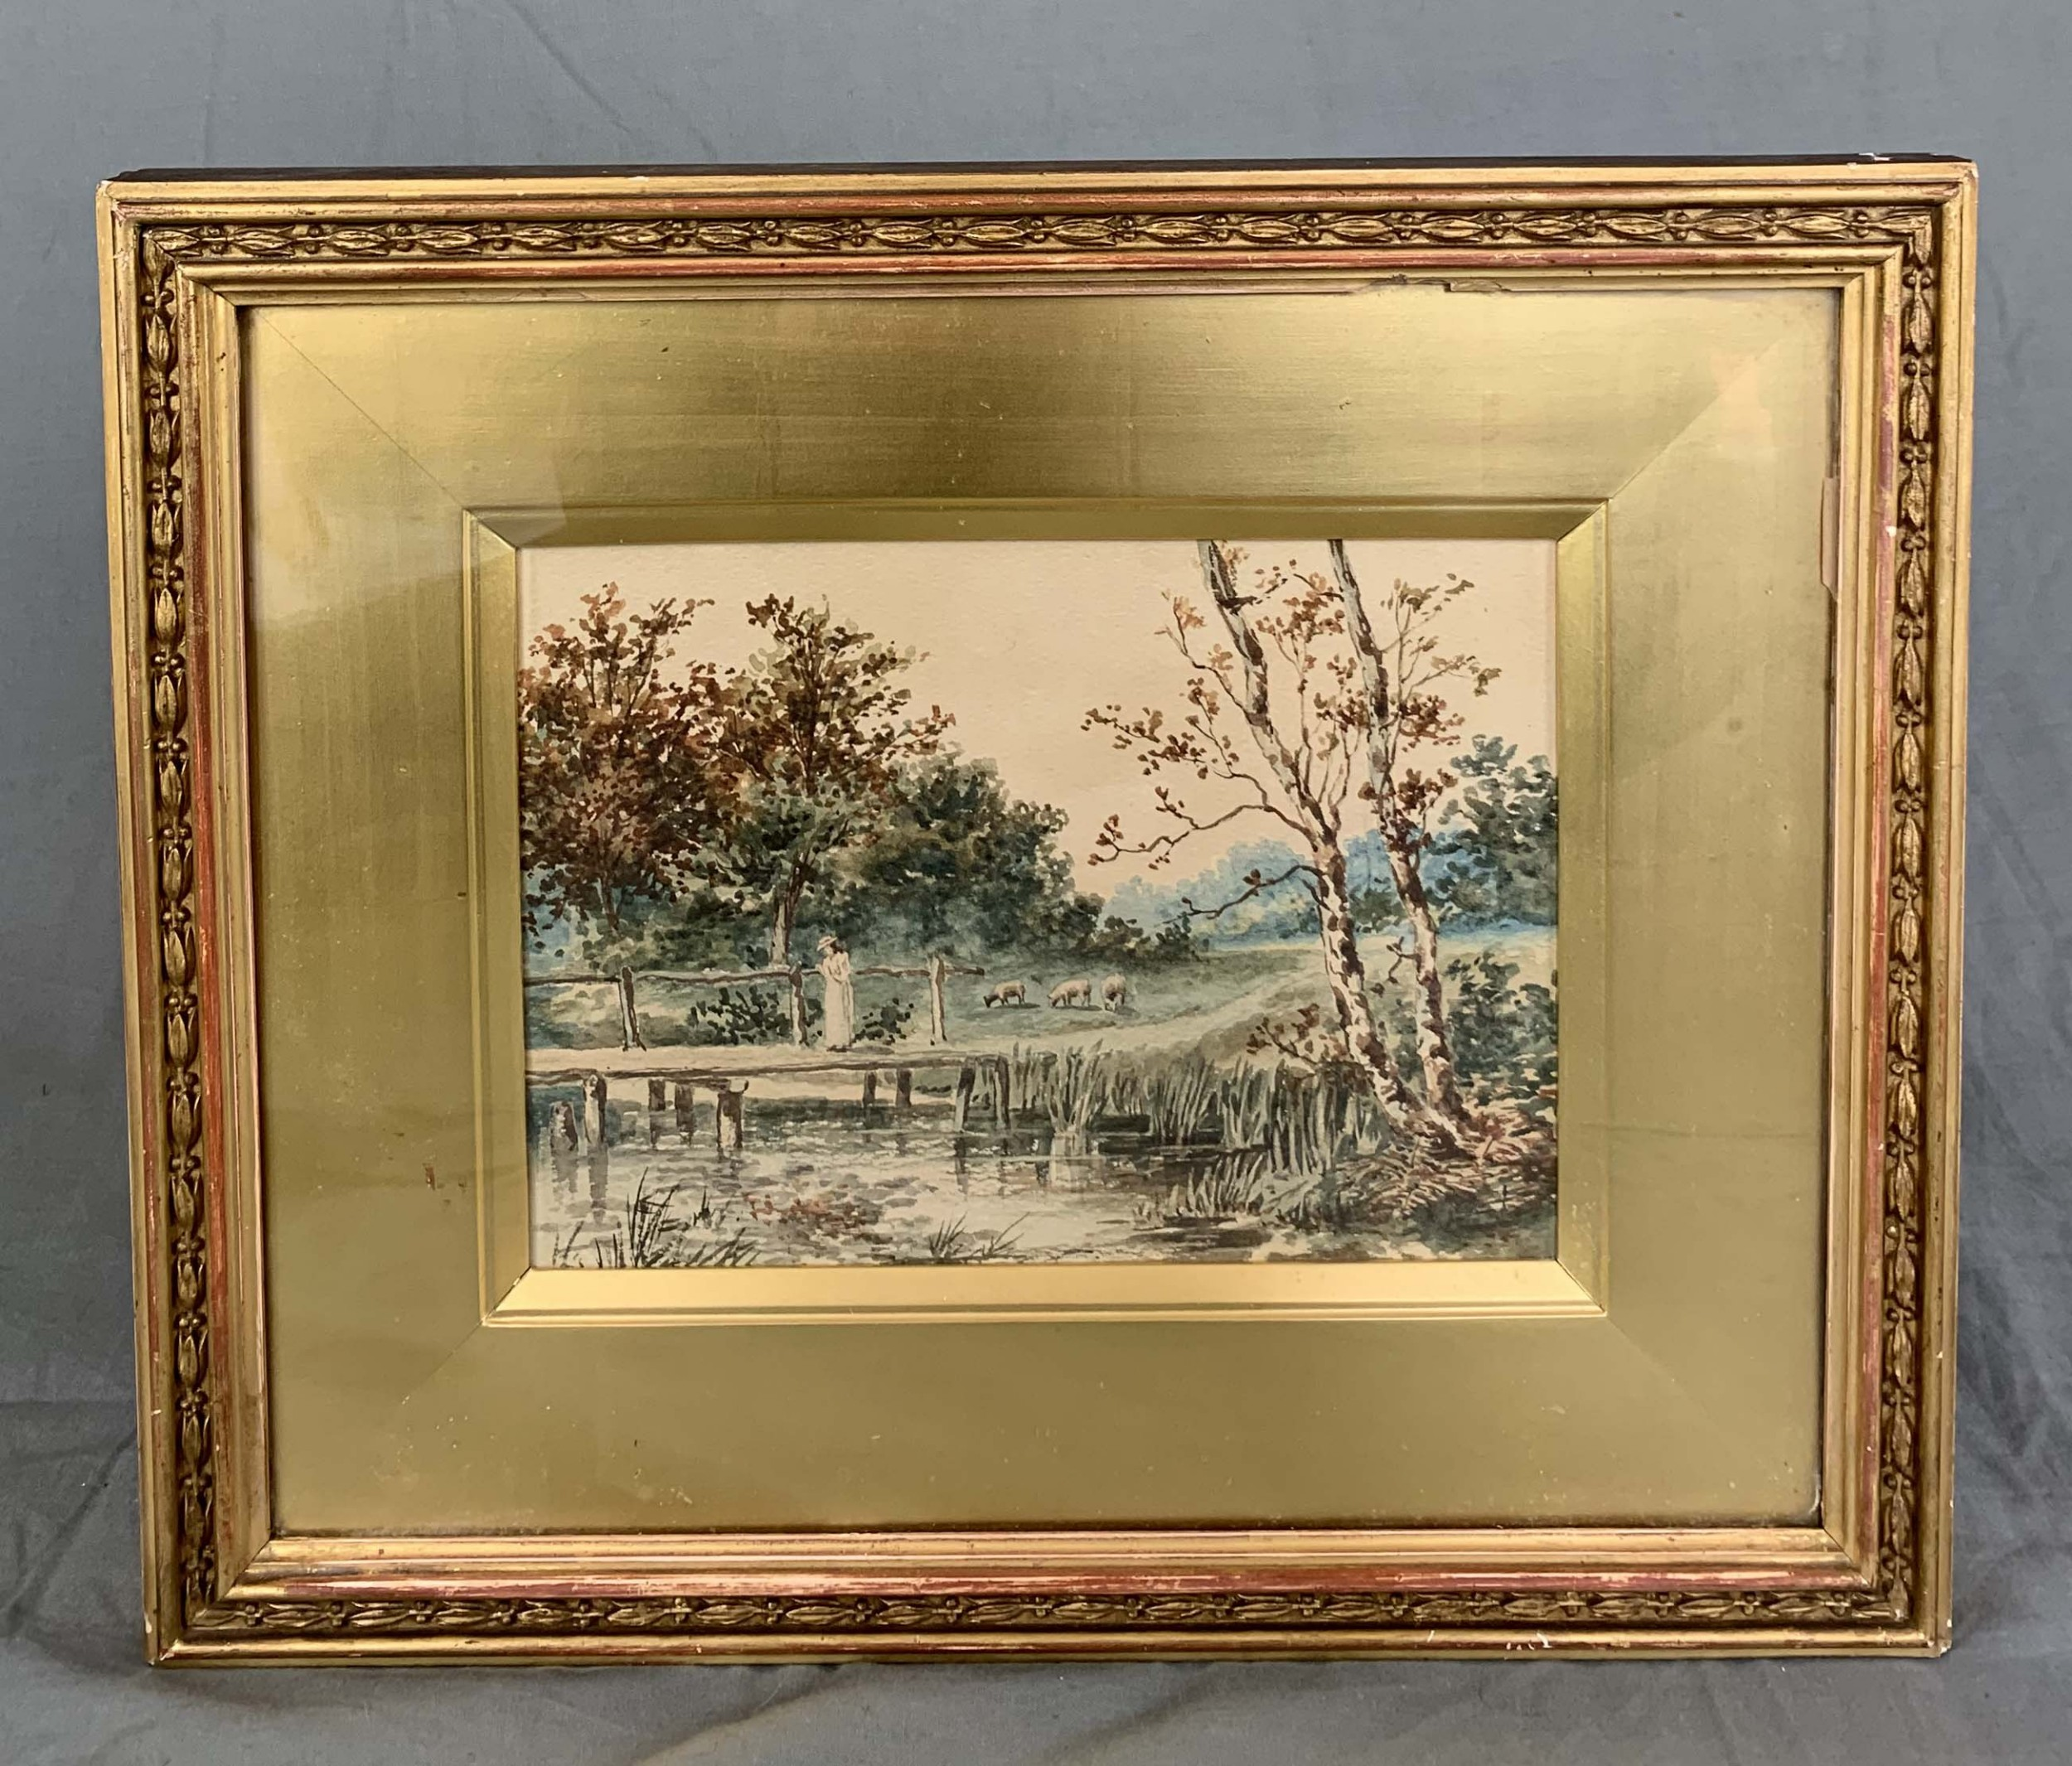 19th century english river landscape watercolour painting